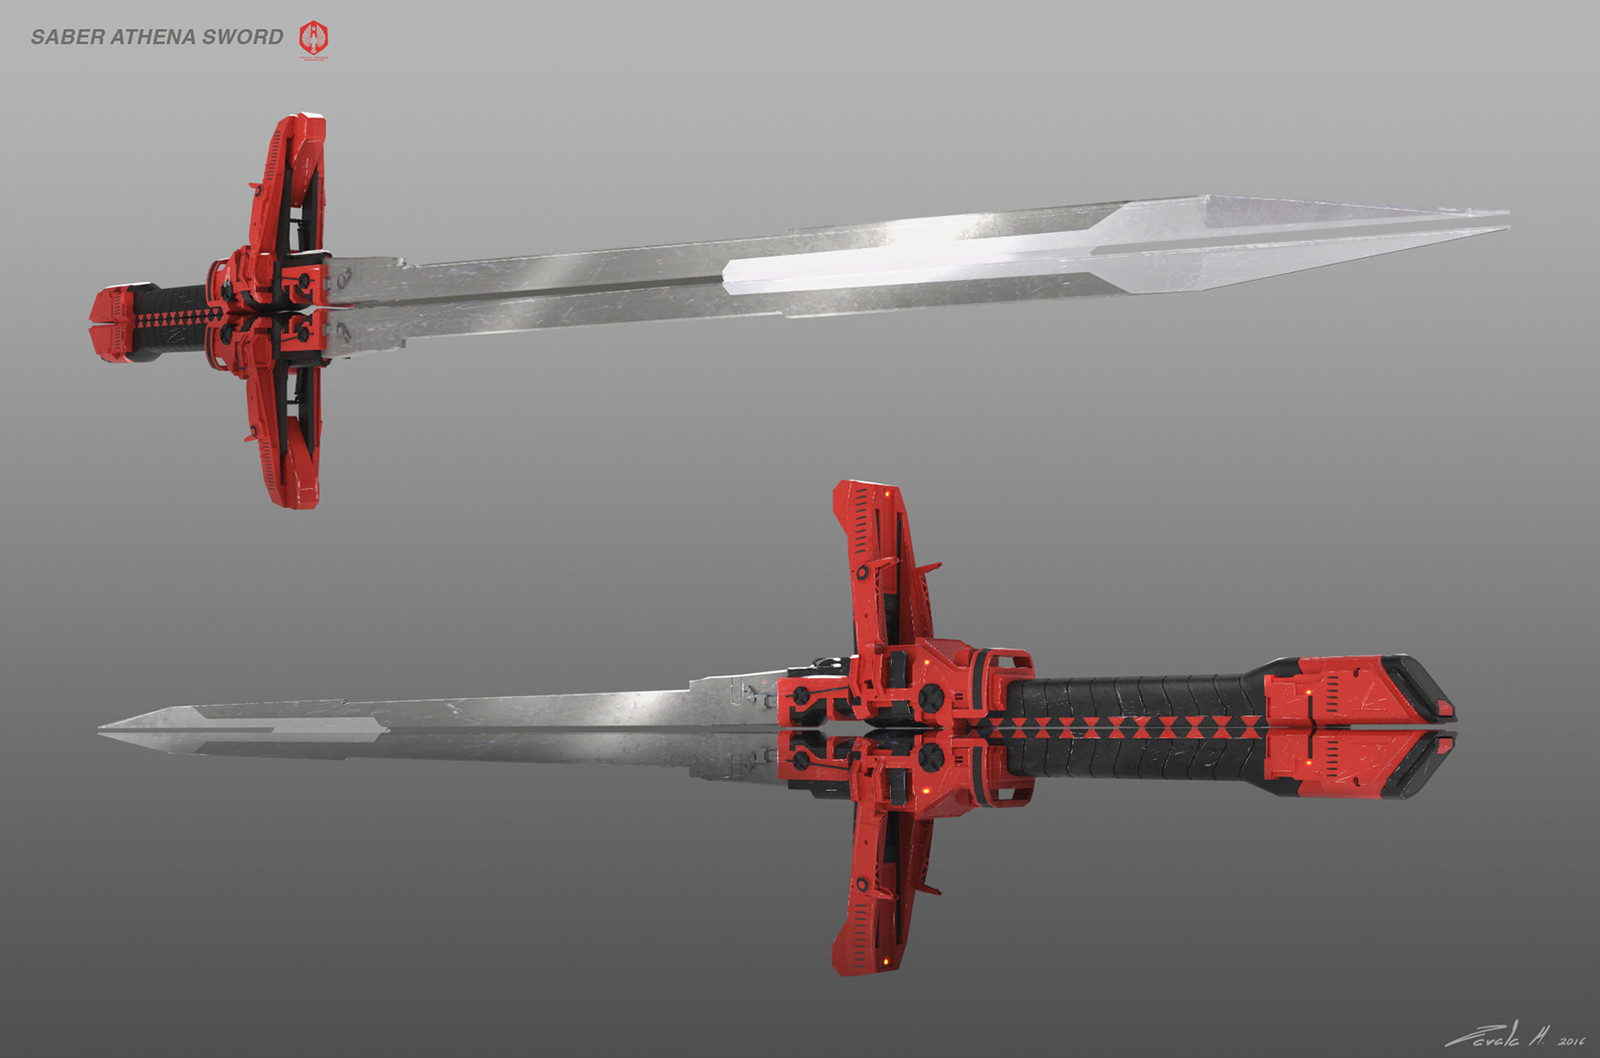 Saber Athena's mandoble sword version